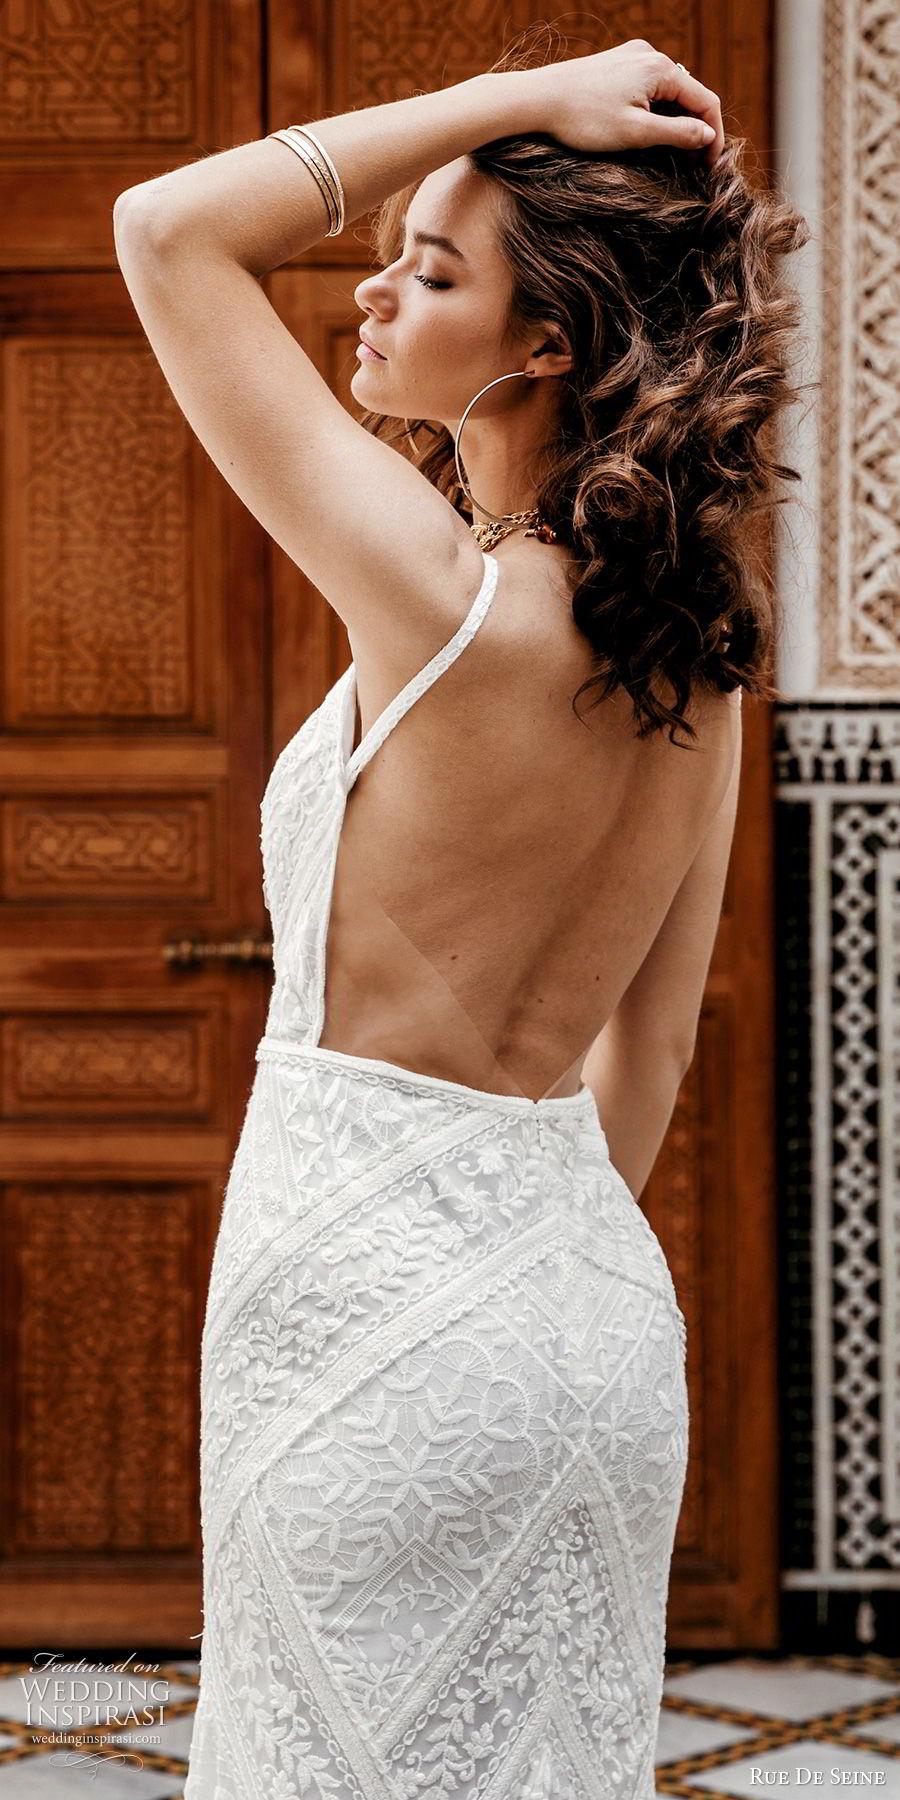 rue de seine 2019 bridal sleeveless thick straps deep v neckline lace fit flare sheath wedding dress (11) boho chic romantic open back chapel train zbv